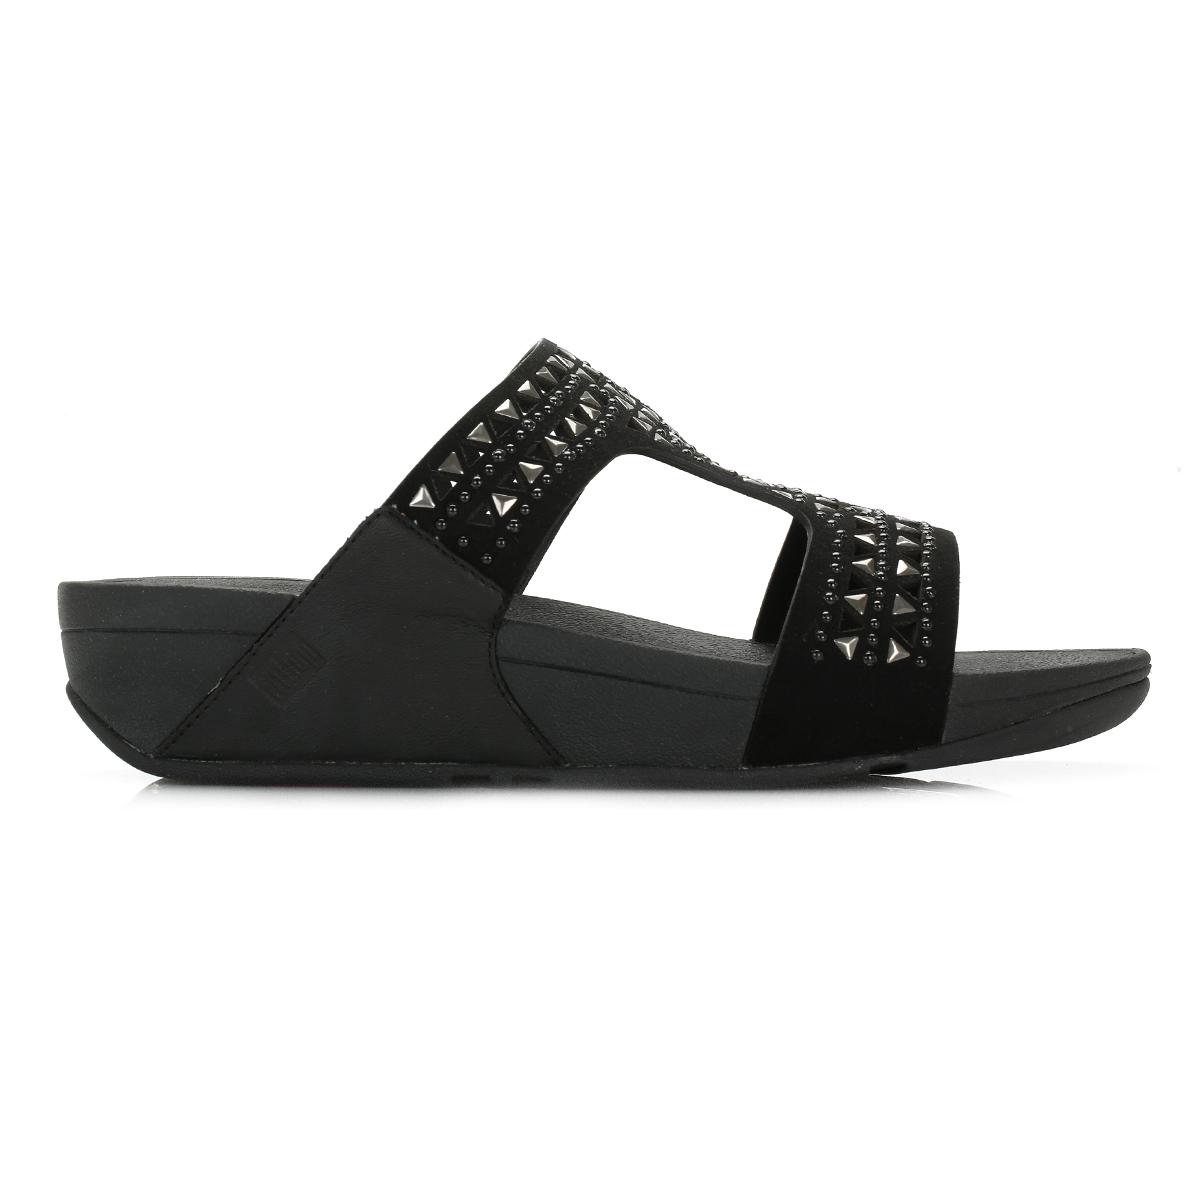 Awesome Women Vionic Orthaheel Shore Double Strap Slide Sandal 44SHORE Black 100% Authen | EBay